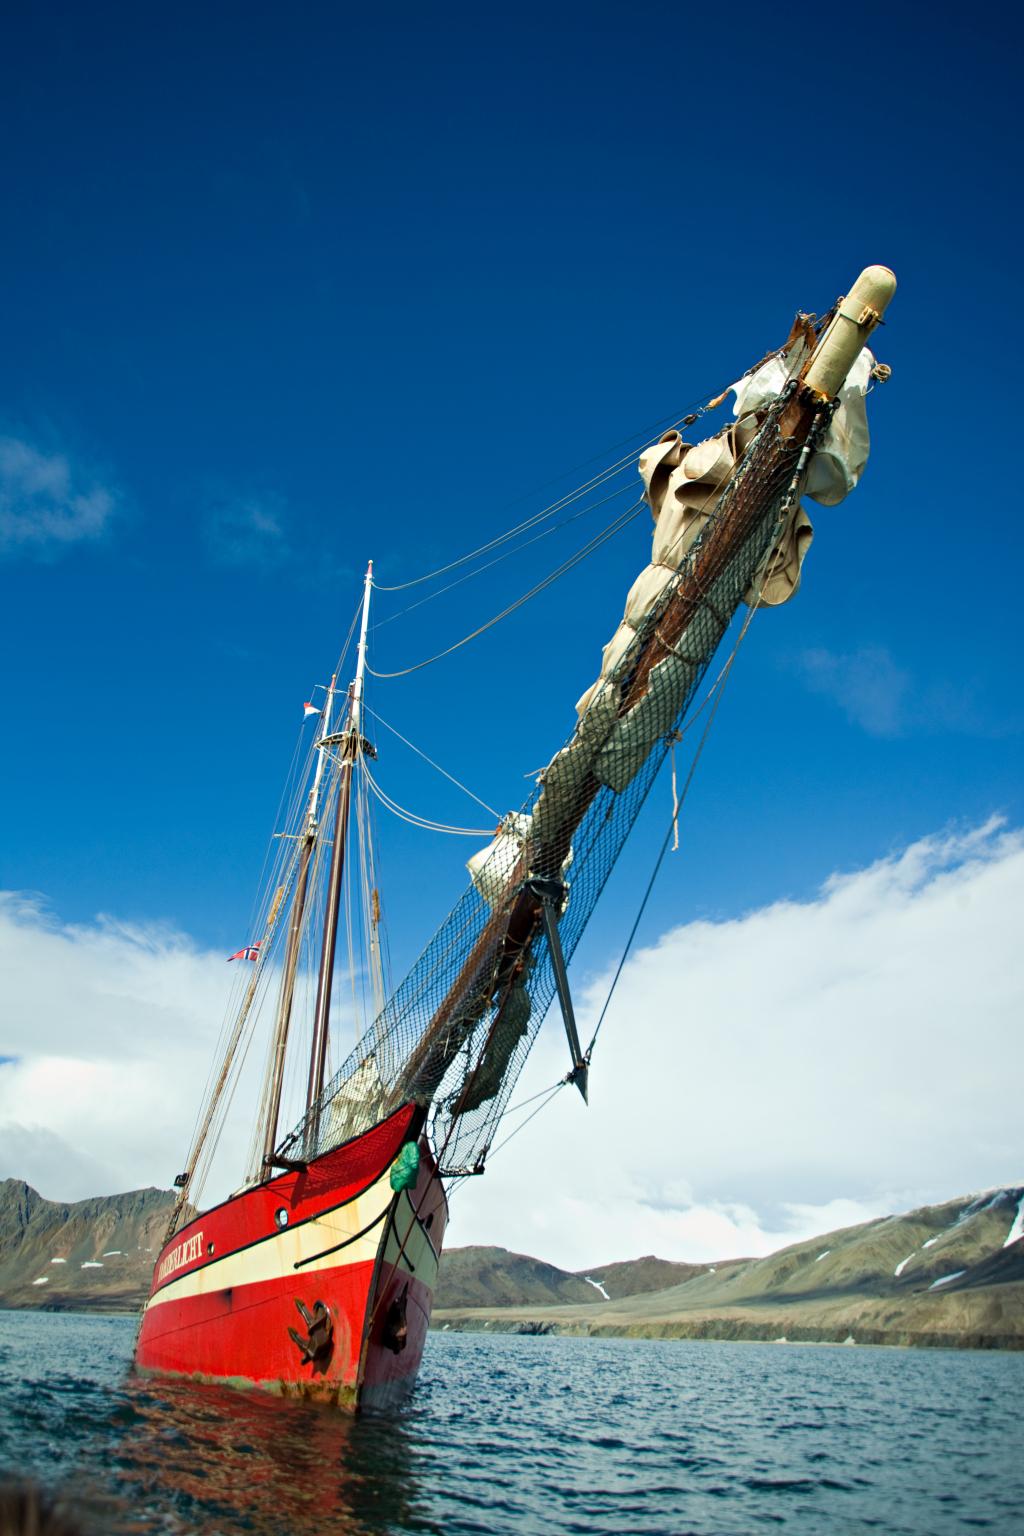 Sailing ship close - David Slater